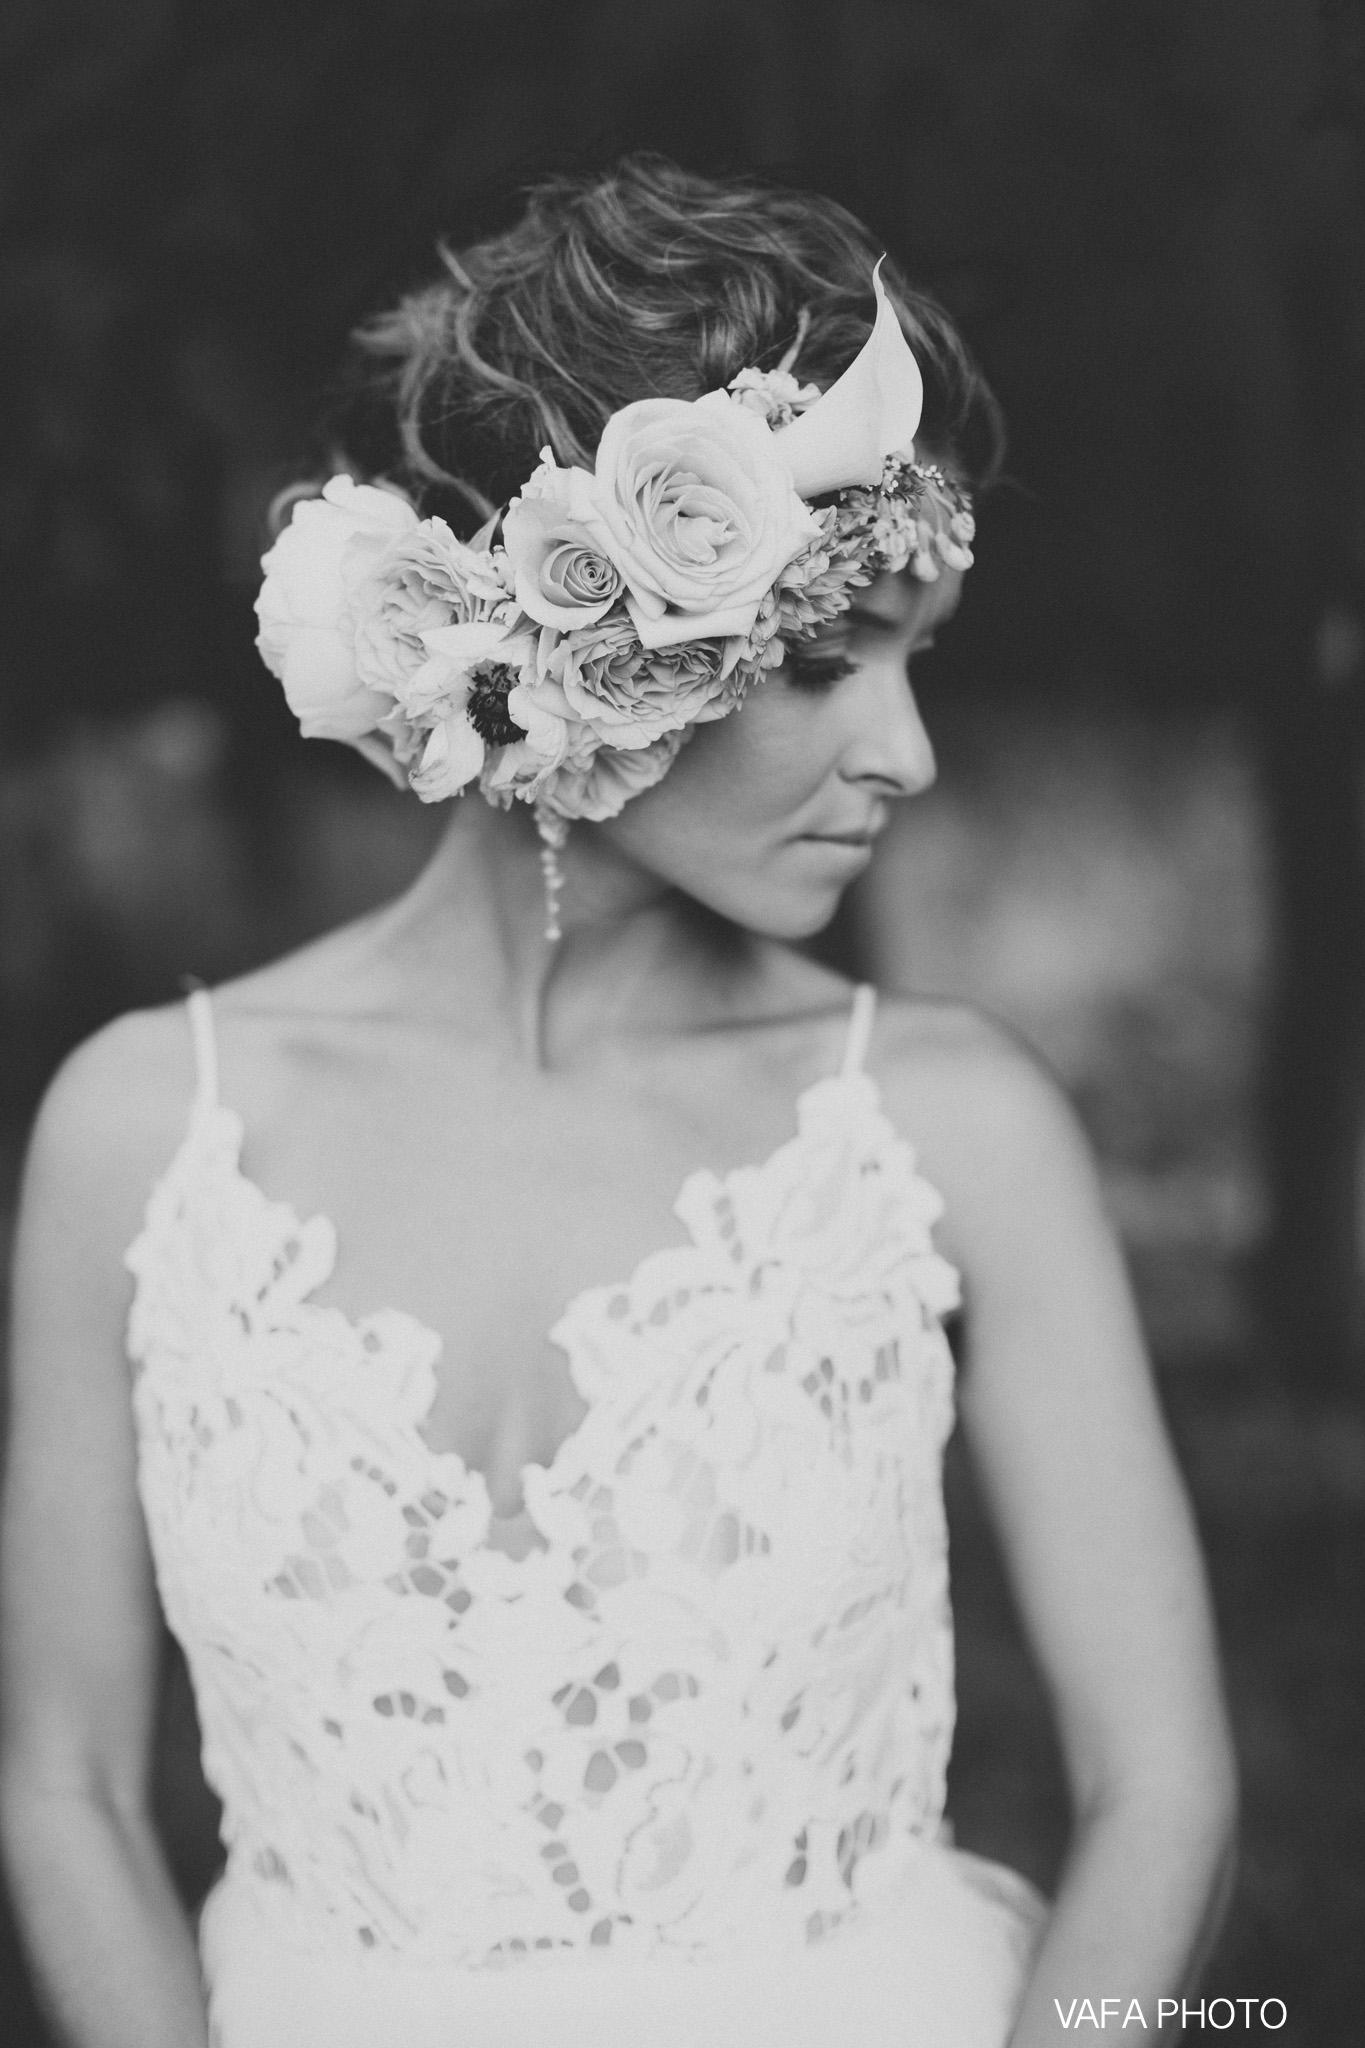 The-Felt-Estate-Wedding-Kailie-David-Vafa-Photo-717.jpg